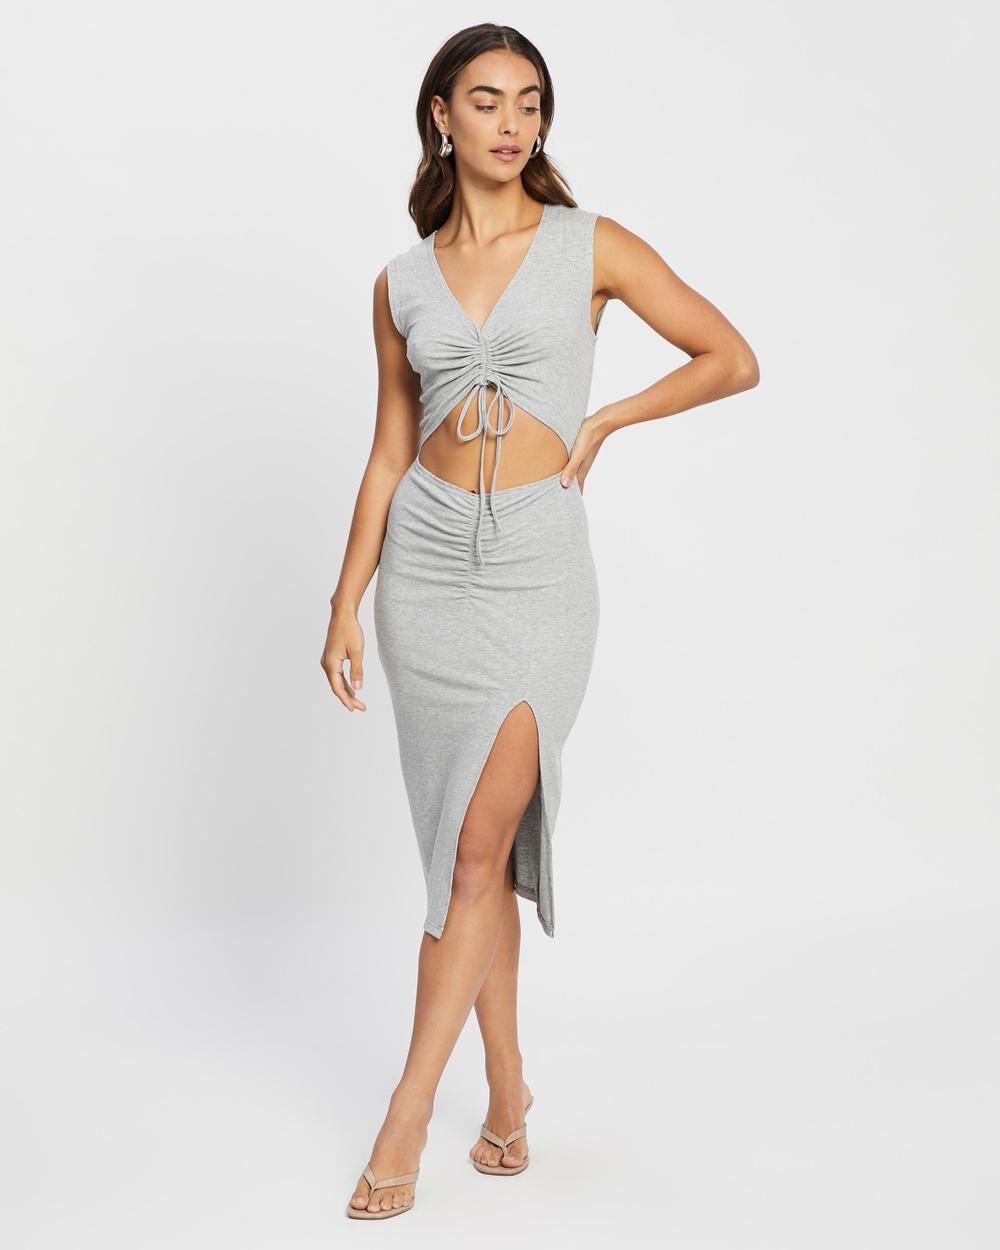 4th & Reckless Jett Dress Bodycon Dresses Grey Jersey